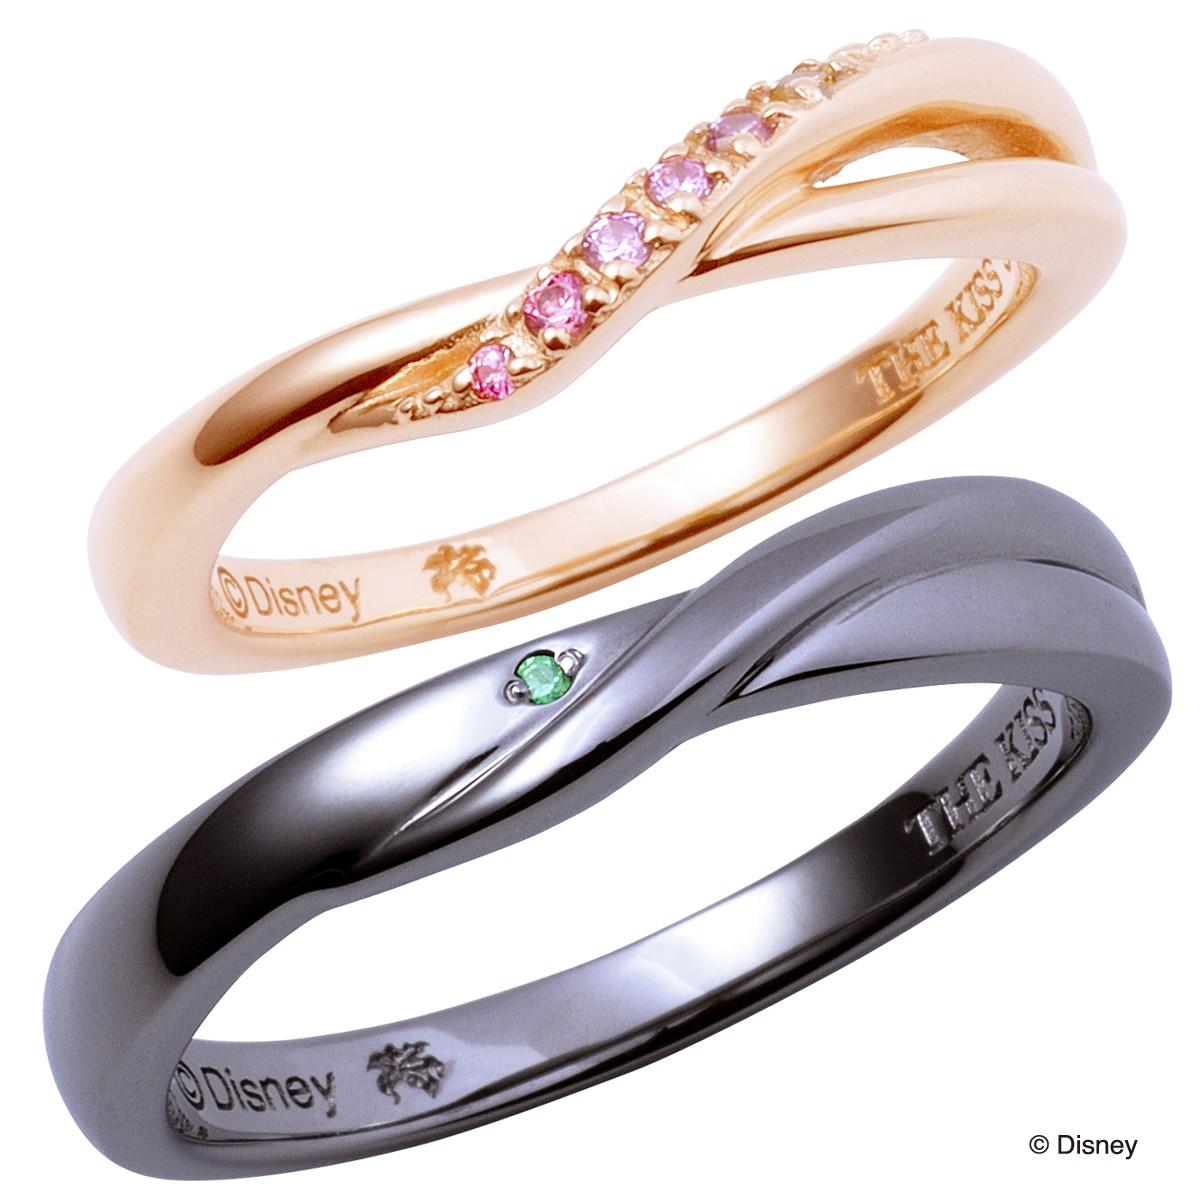 THE KISS ディズニー コレクション ペアリング 男性 女性 2個ペア シルバー リング ラプンツェル プリンセス レディース メンズ ペア ザ・キッス お揃い 指輪 誕生日 記念日 メンズ 結婚指輪 刻印可能